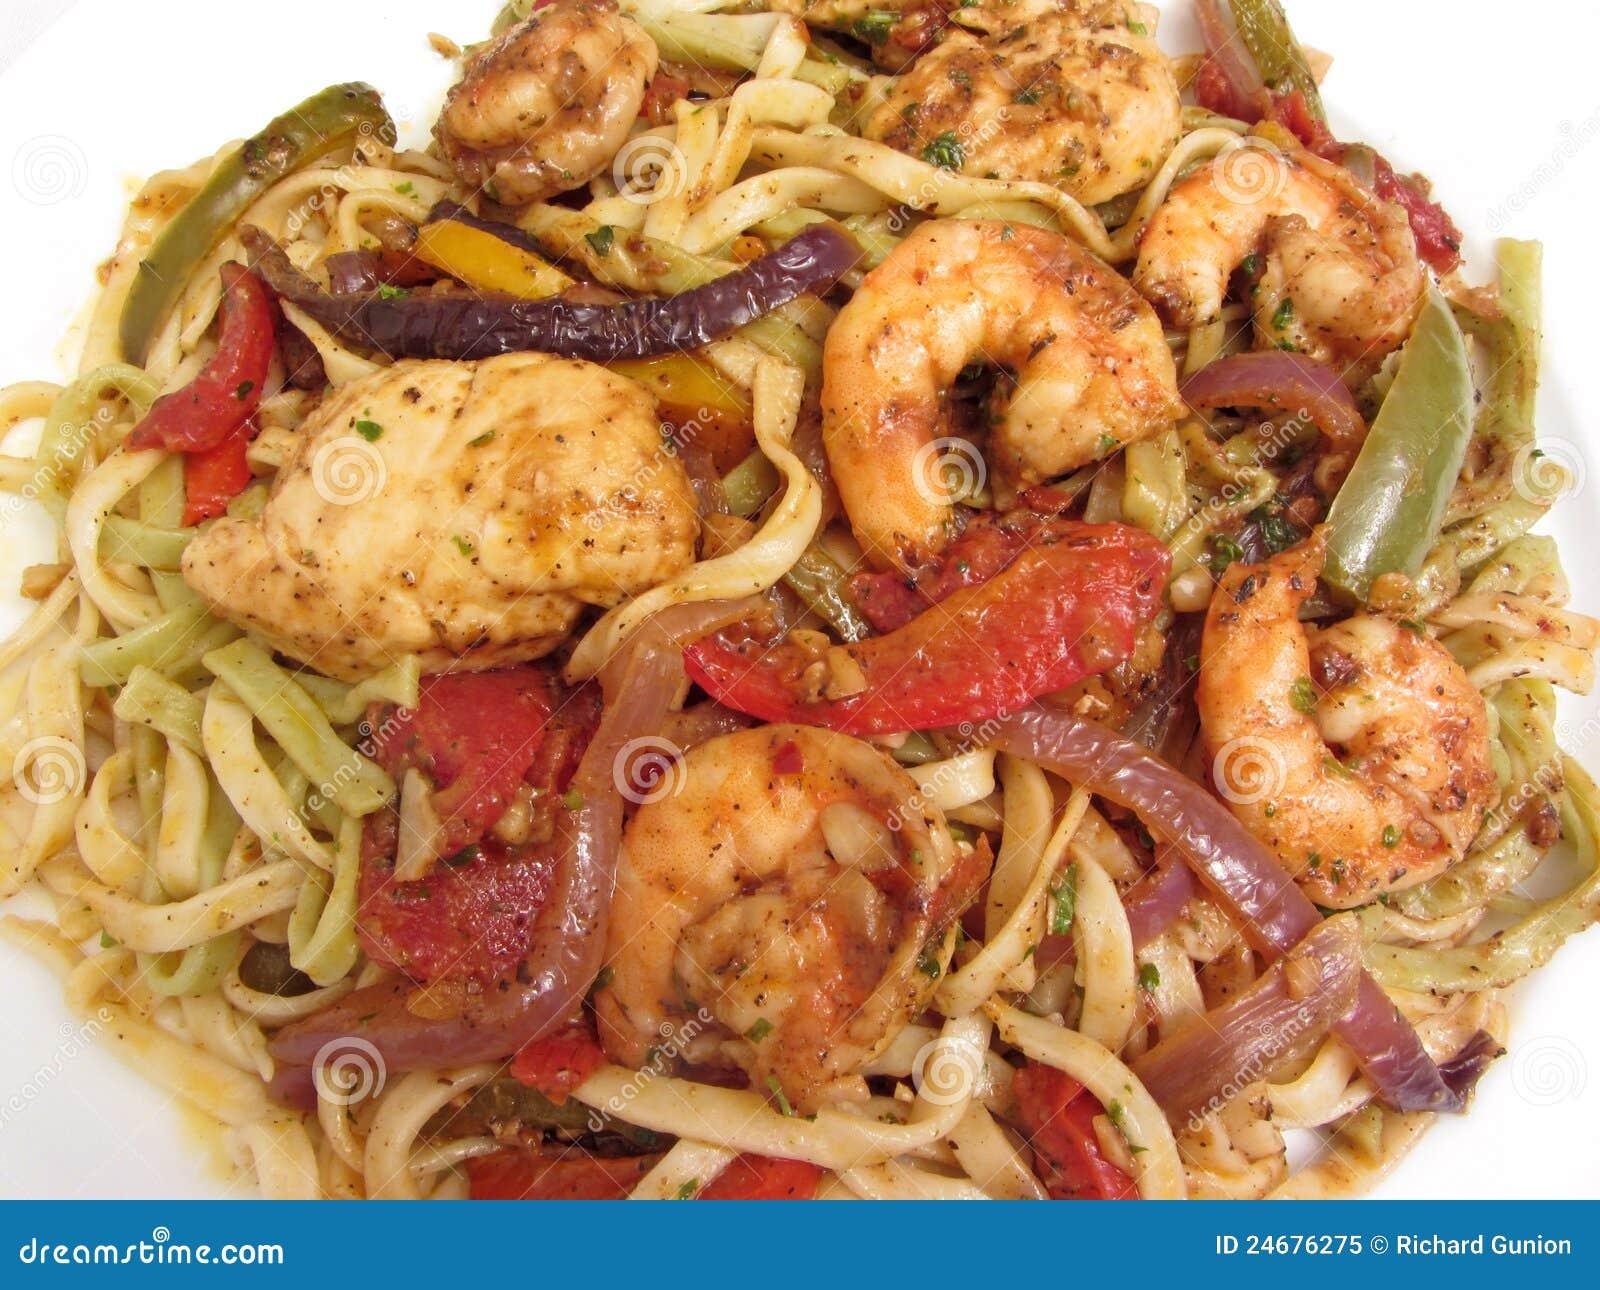 Jambalaya With Shrimp, Chicken And Ham Recipes — Dishmaps